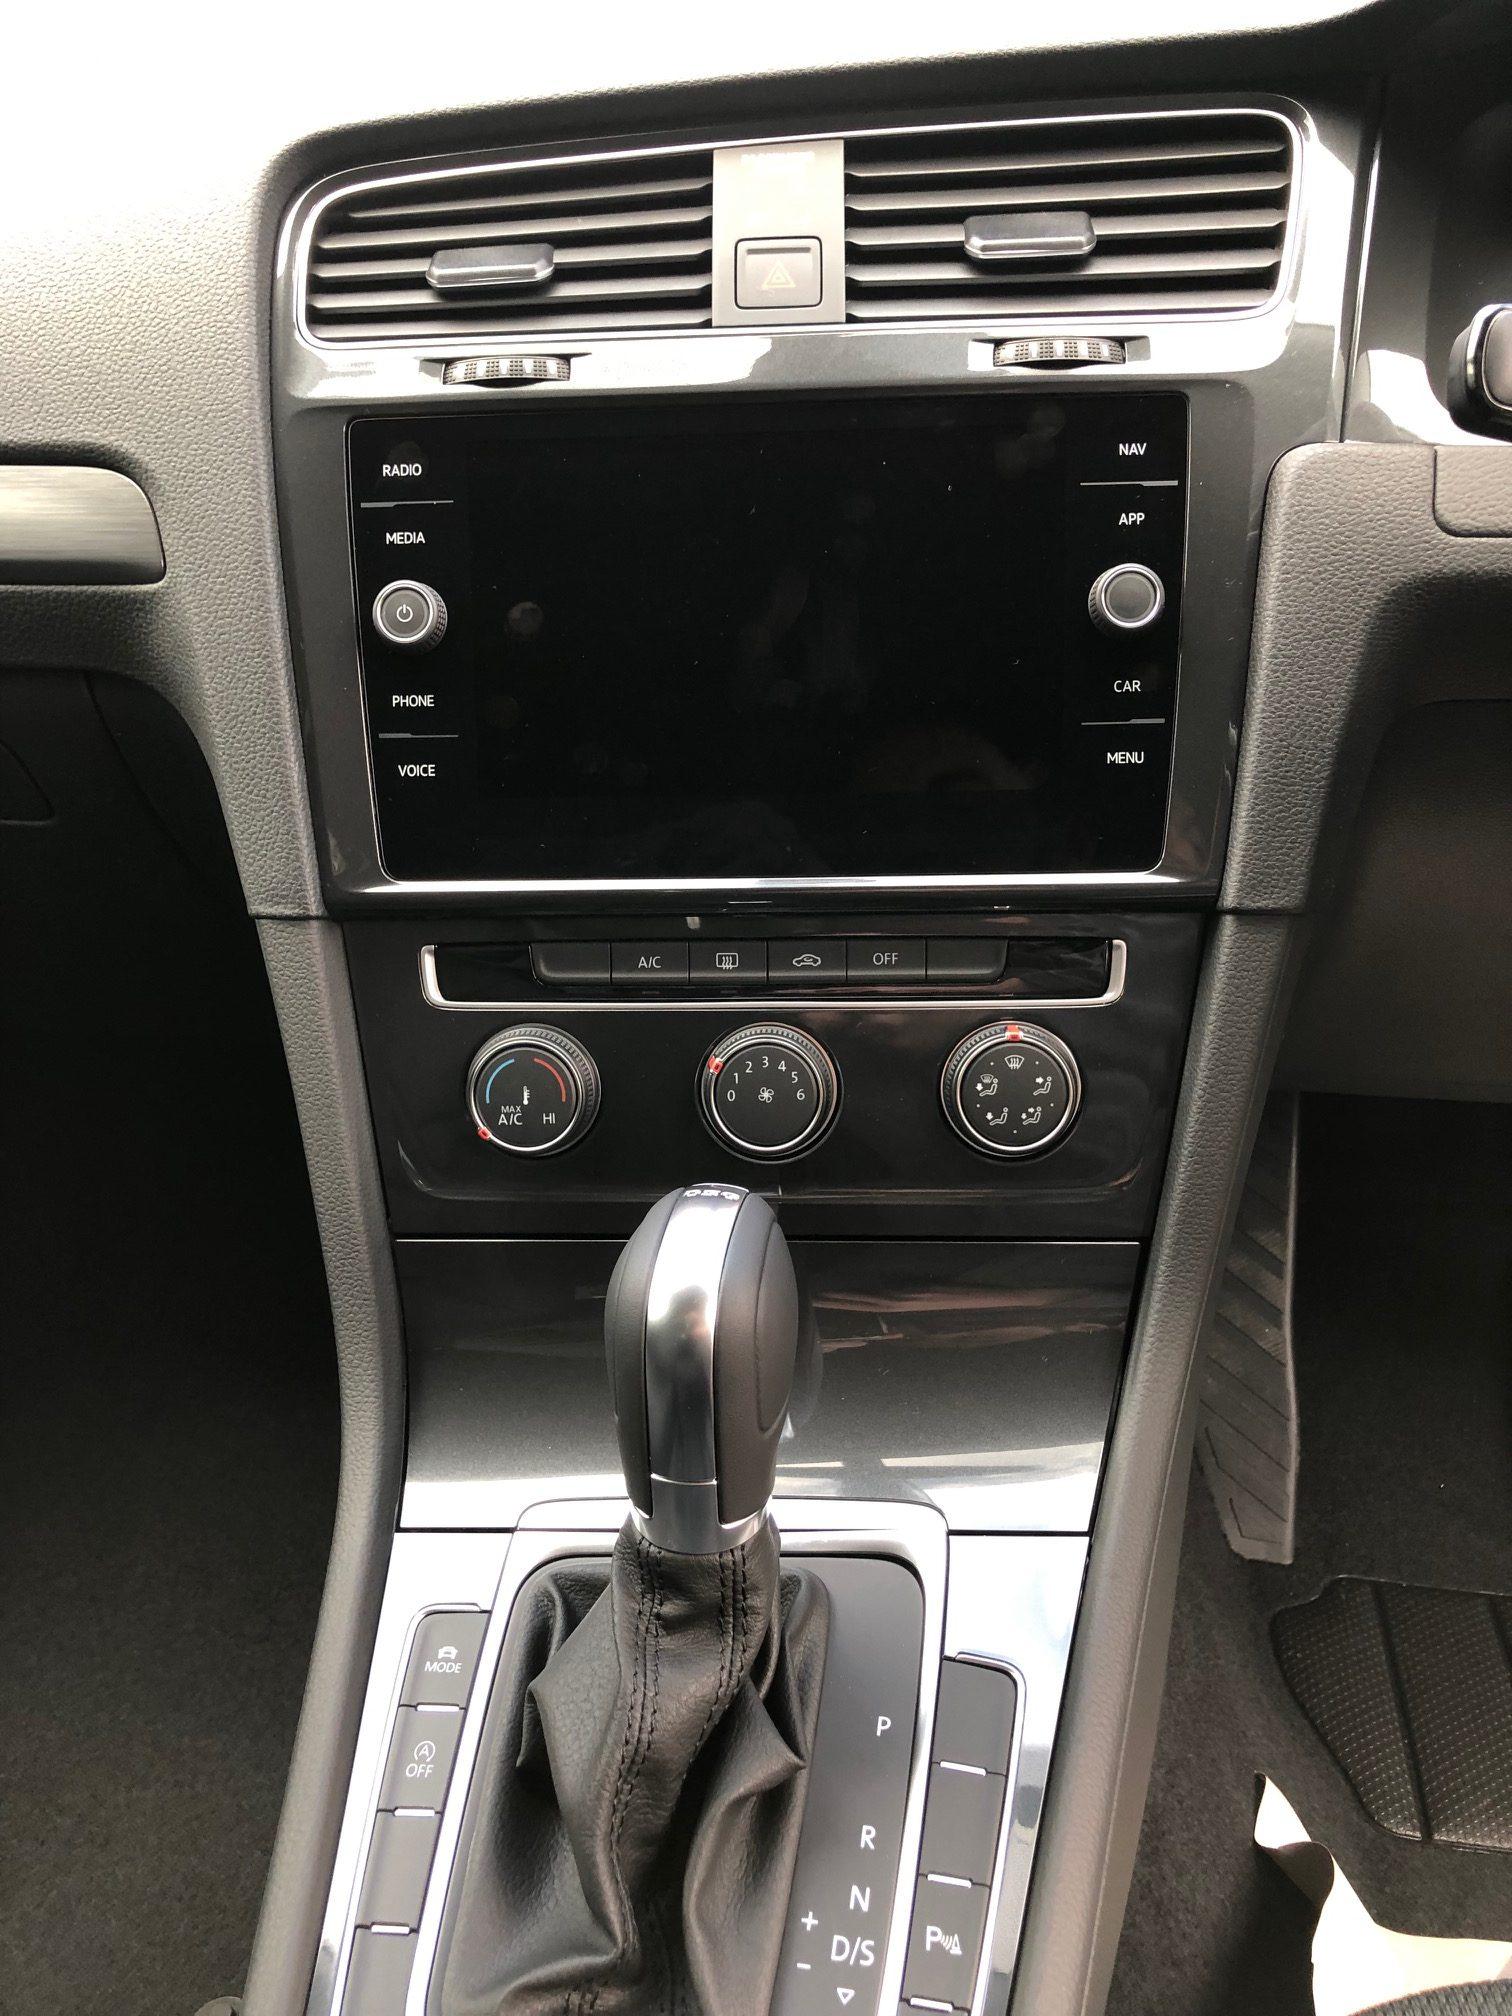 Volkswagen GOLF DIESEL HATCHBACK 1.6 TDI Match 5dr DSG Car Leasing Information